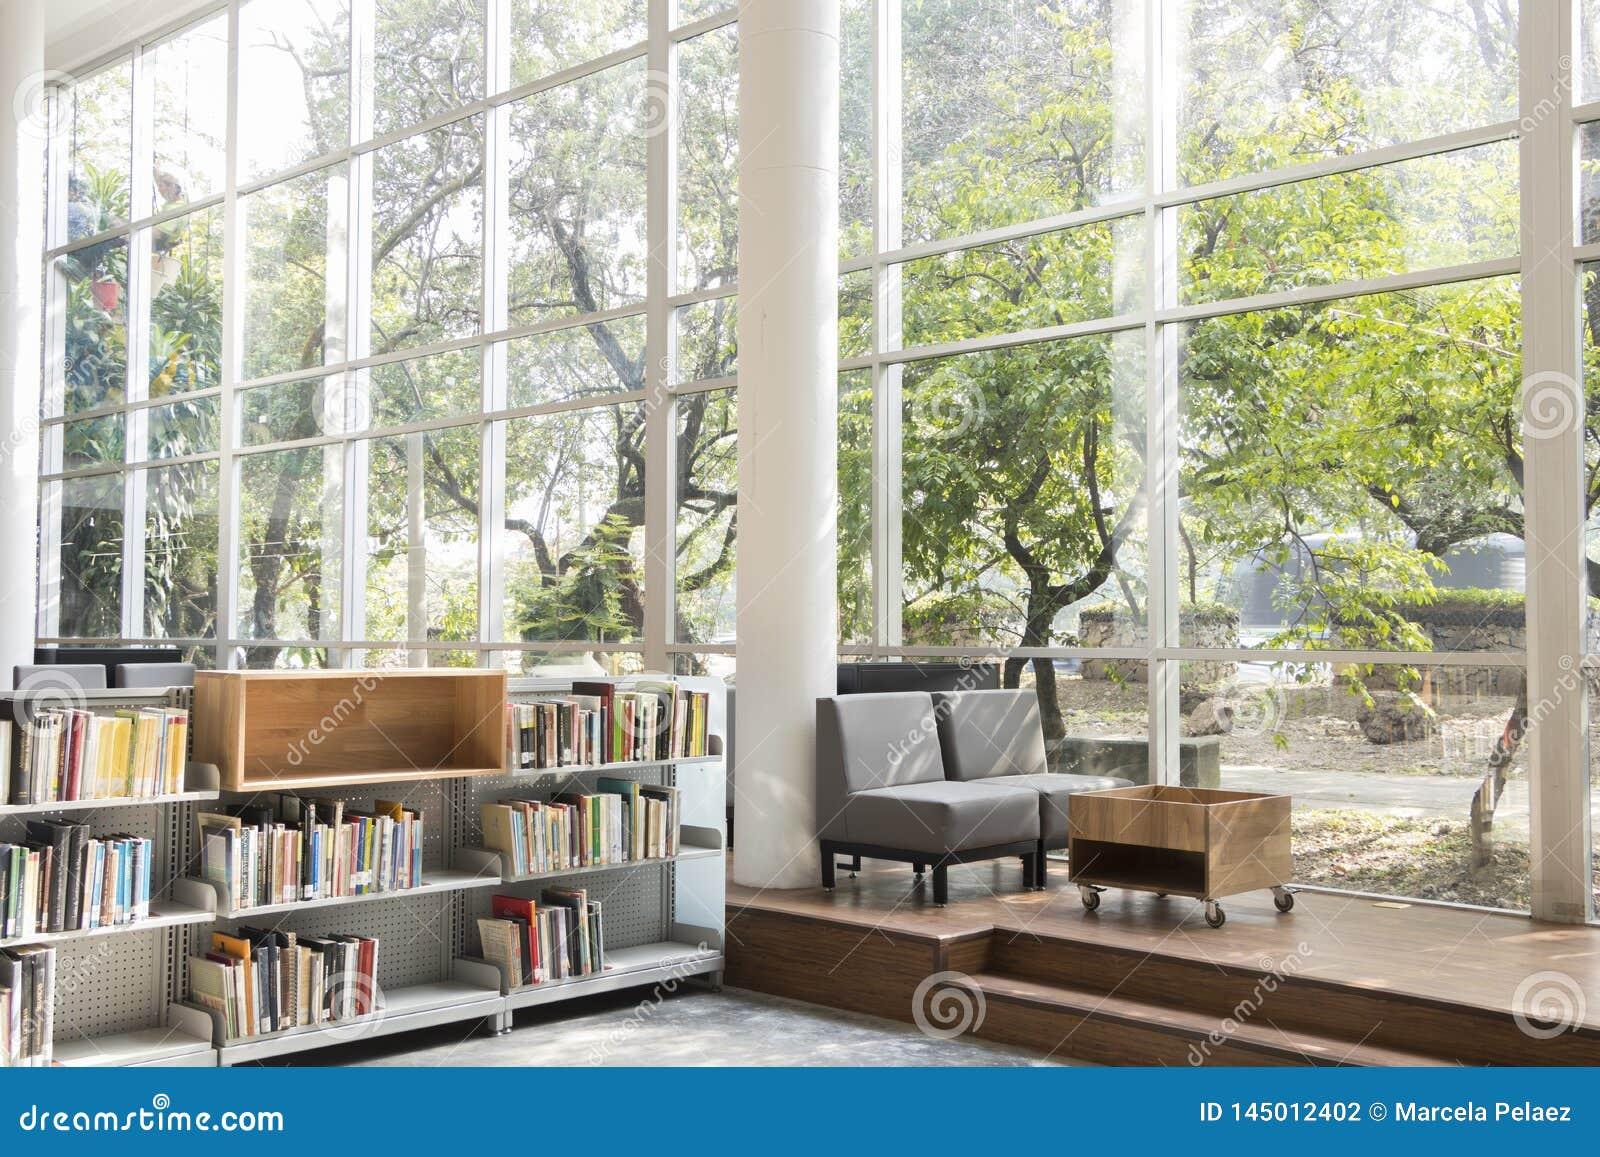 Invigningsdag December 2018 för piloto för pública för offentligt bibliotekmedellin biblioteca